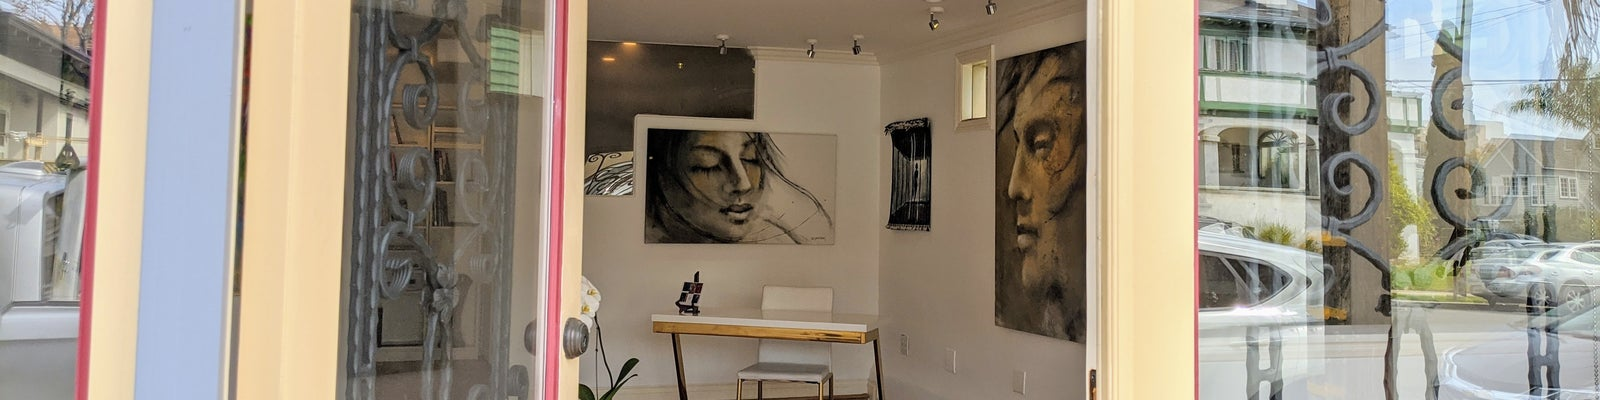 Arredon Art